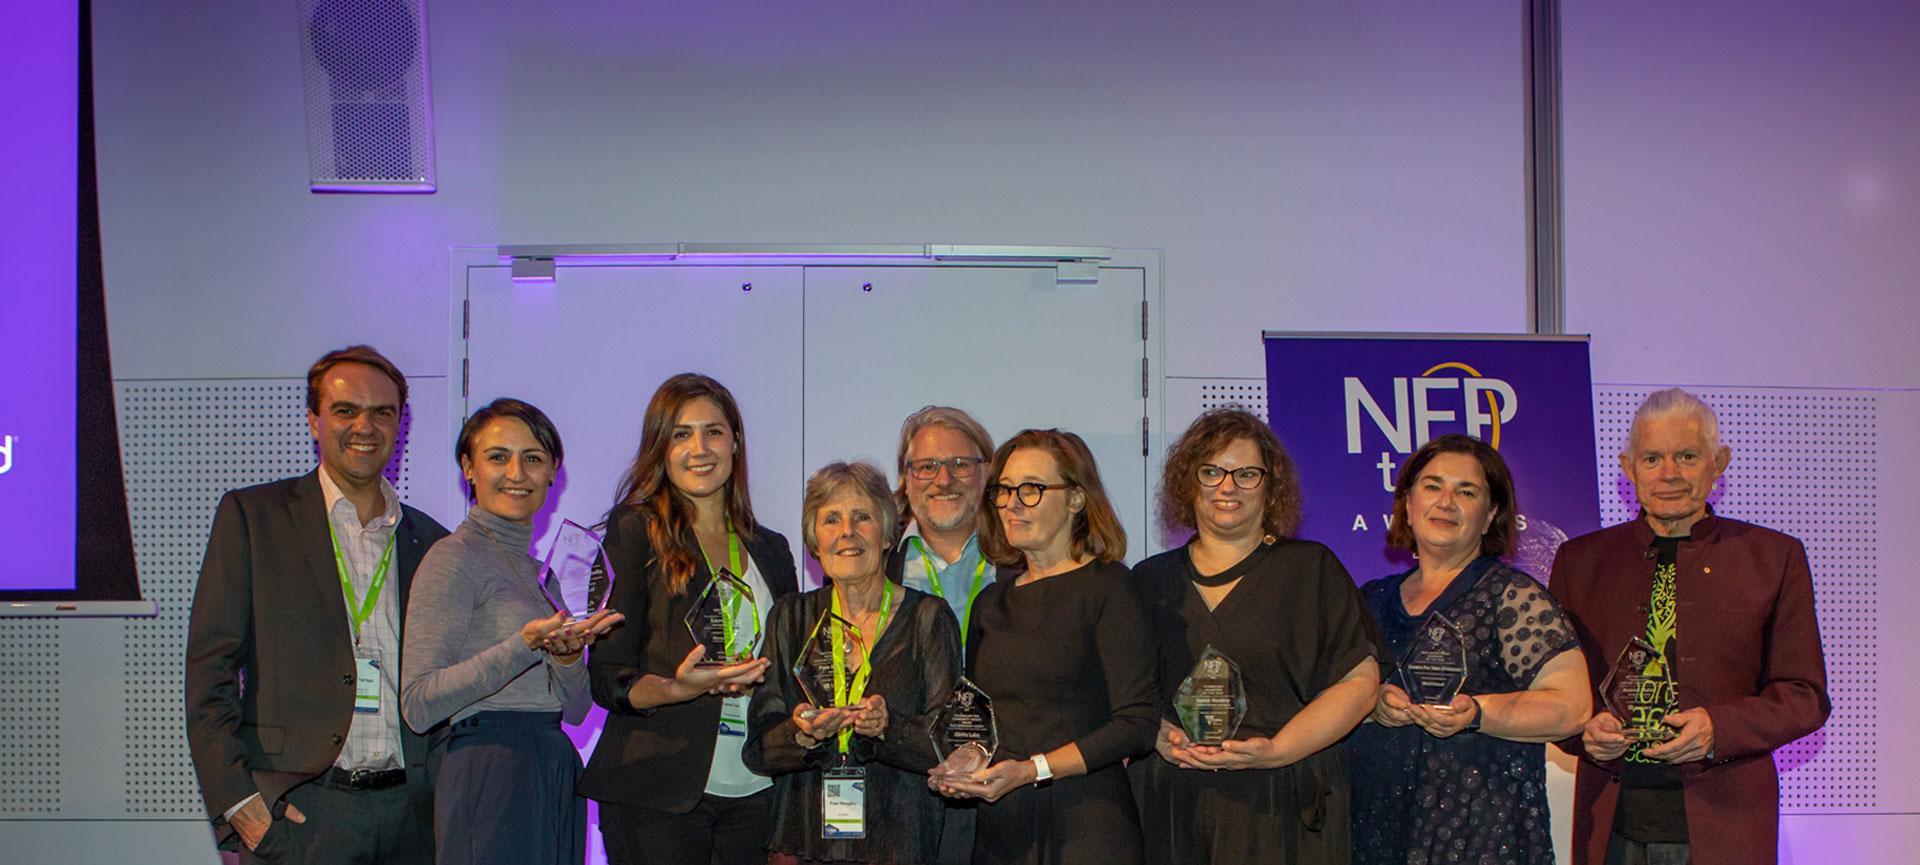 tech-awards-media-release-image.jpg